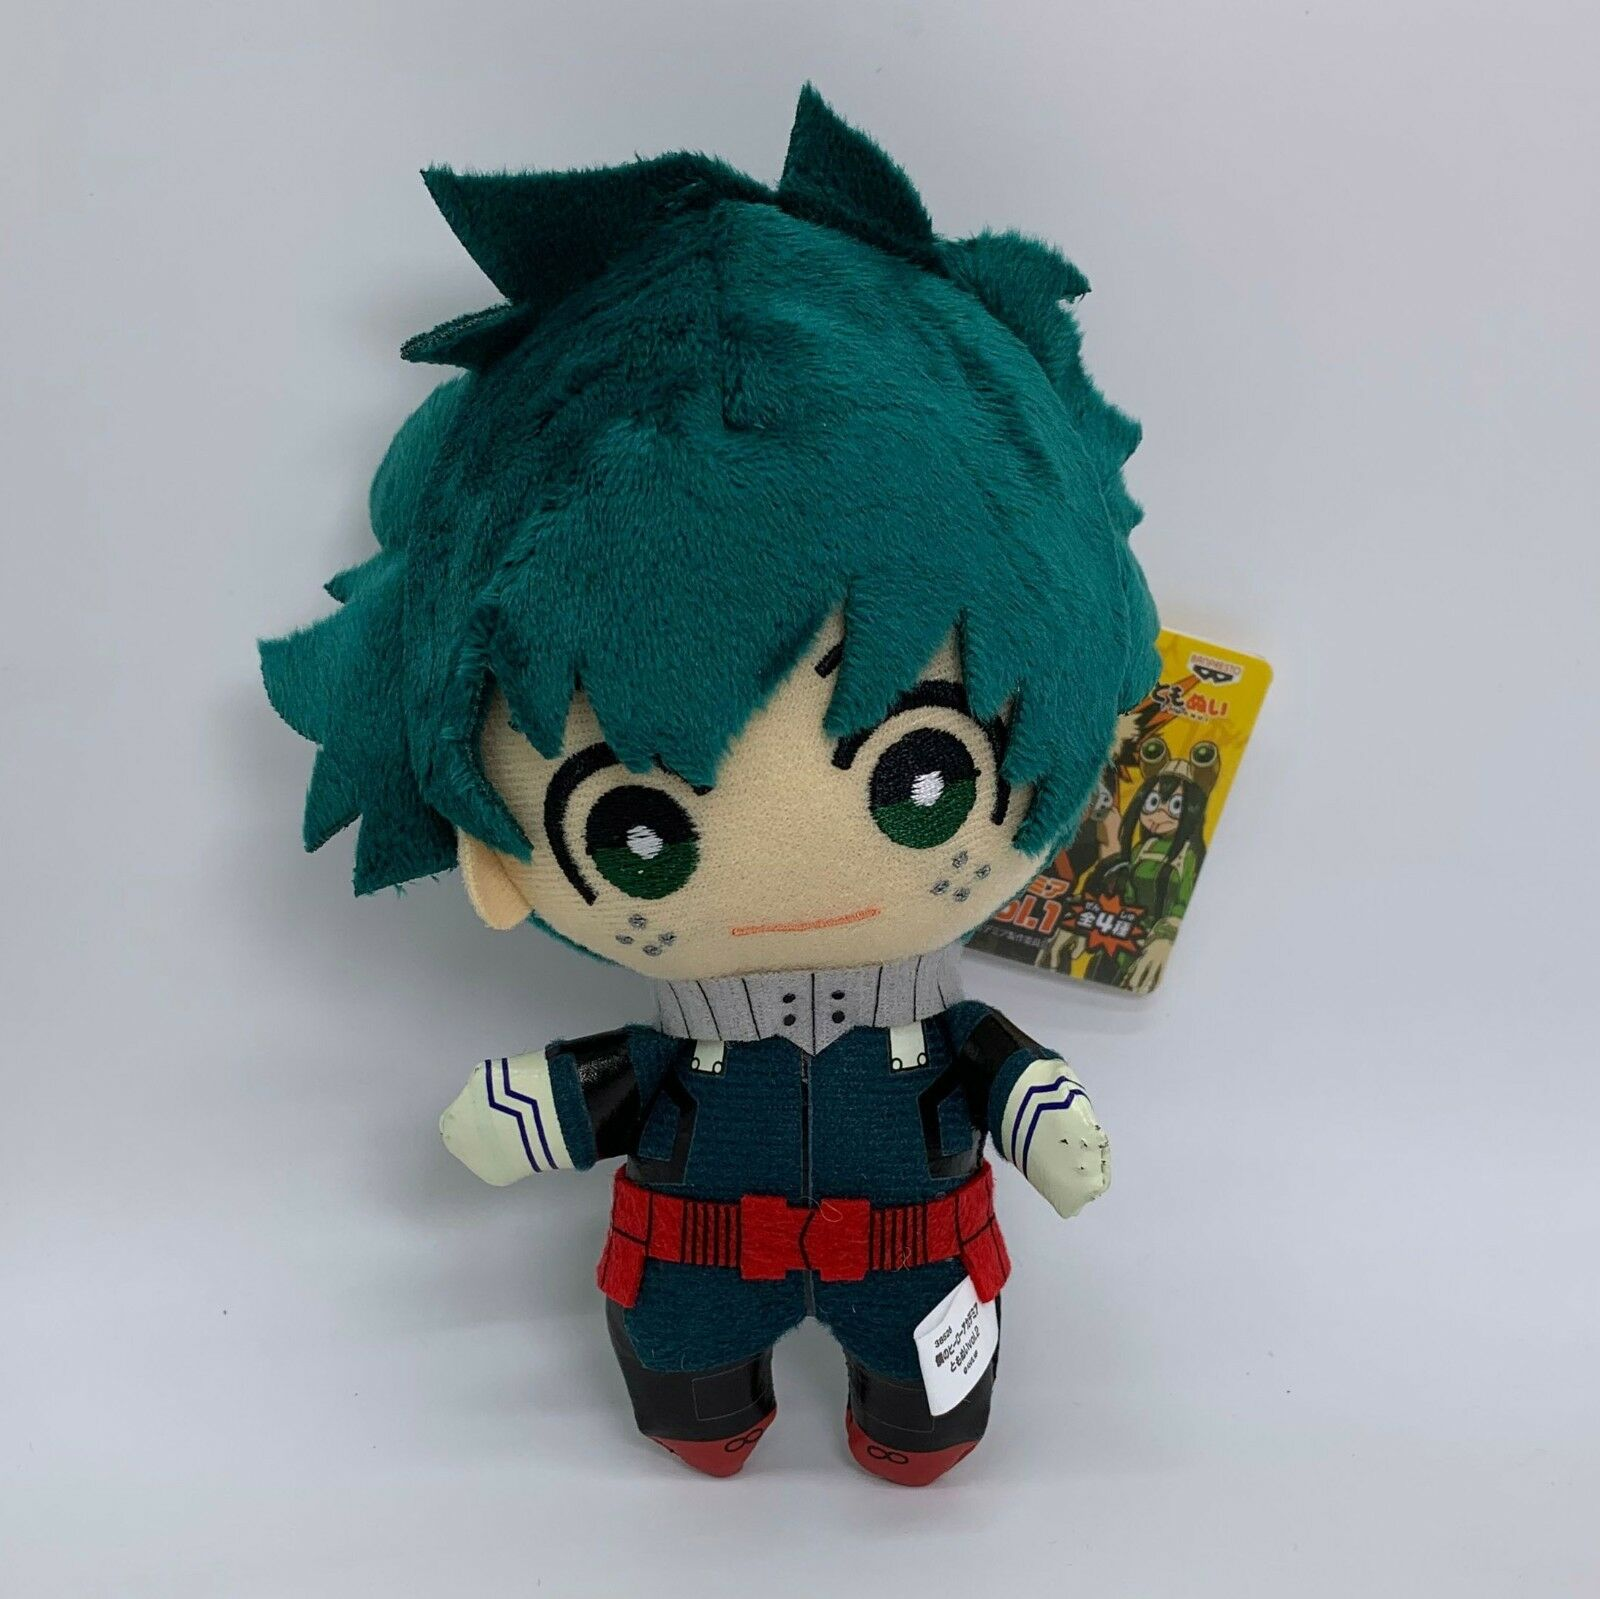 "My Hero Academia Katsuki Bakugo Plush Soft Toy Keychain Pendant Teddy Doll 6.5/"""